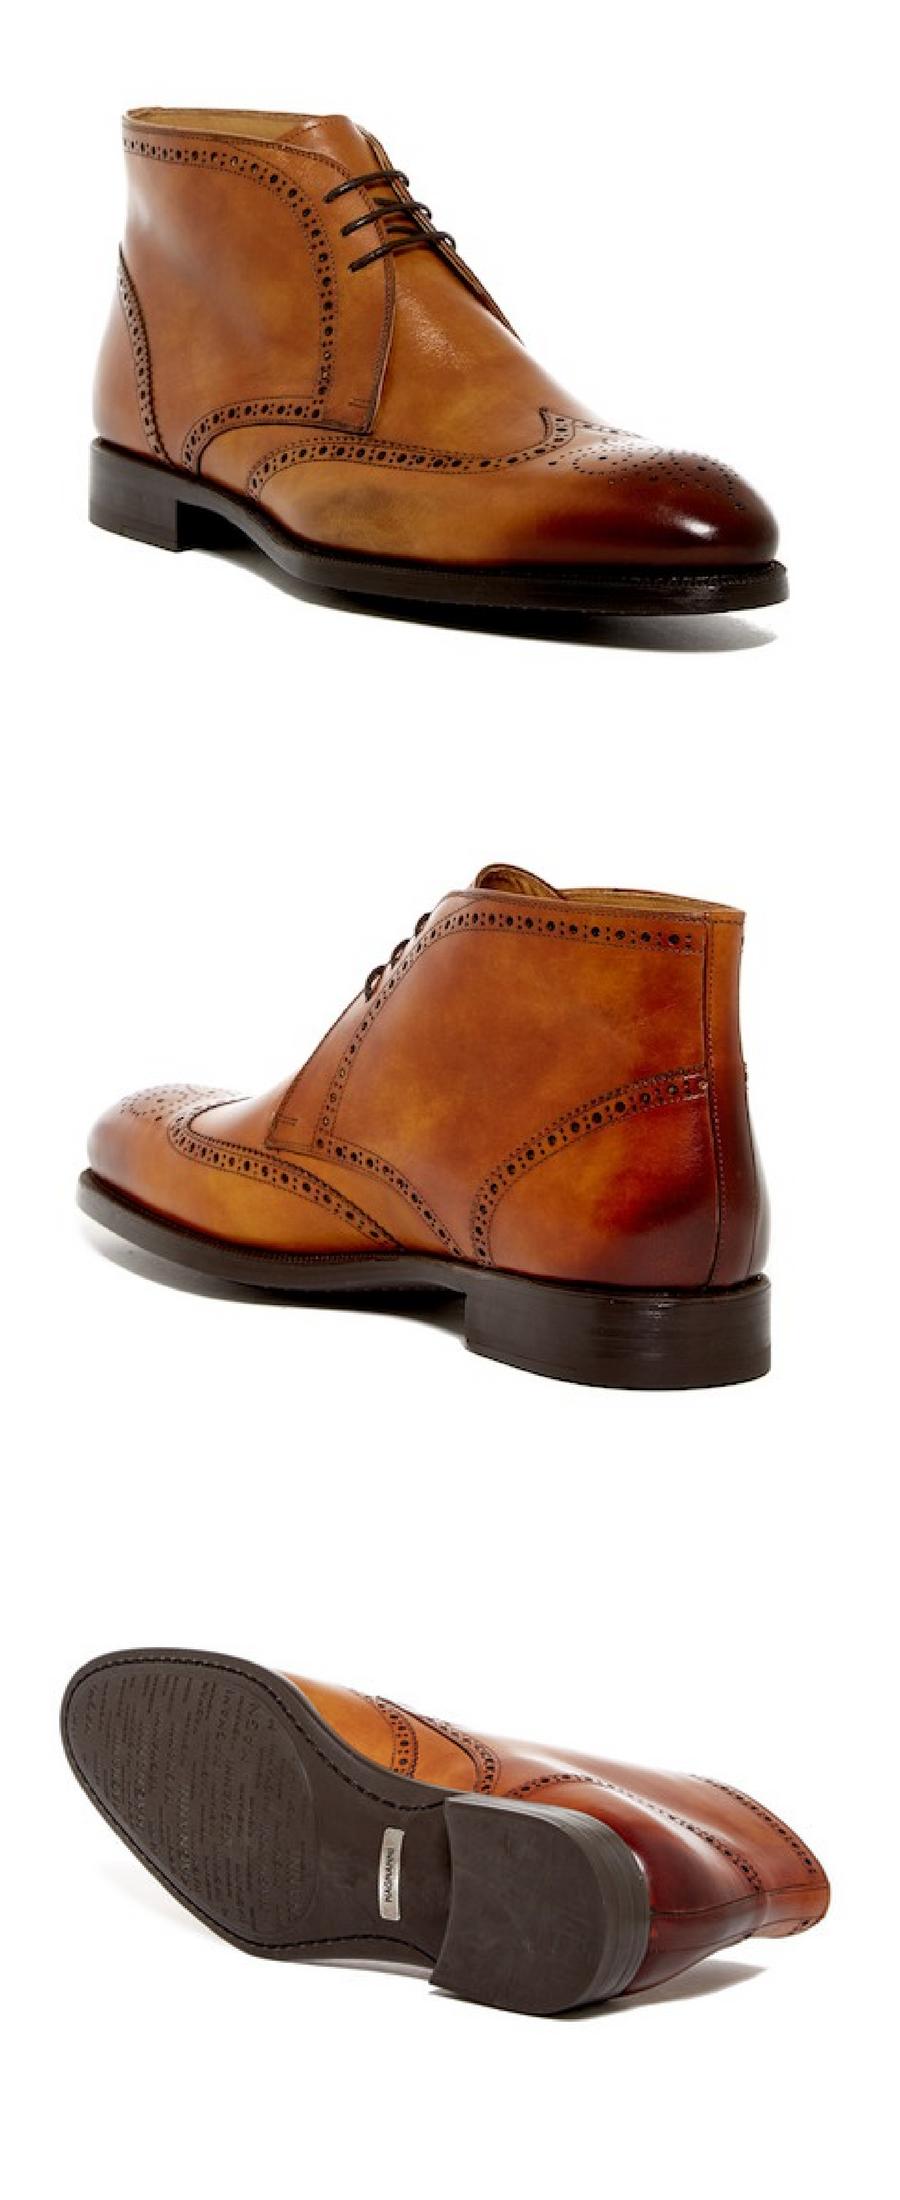 c618b2055c3 Magnanni Regal Leather Chukka Boot  mensfashion shoes for men ...